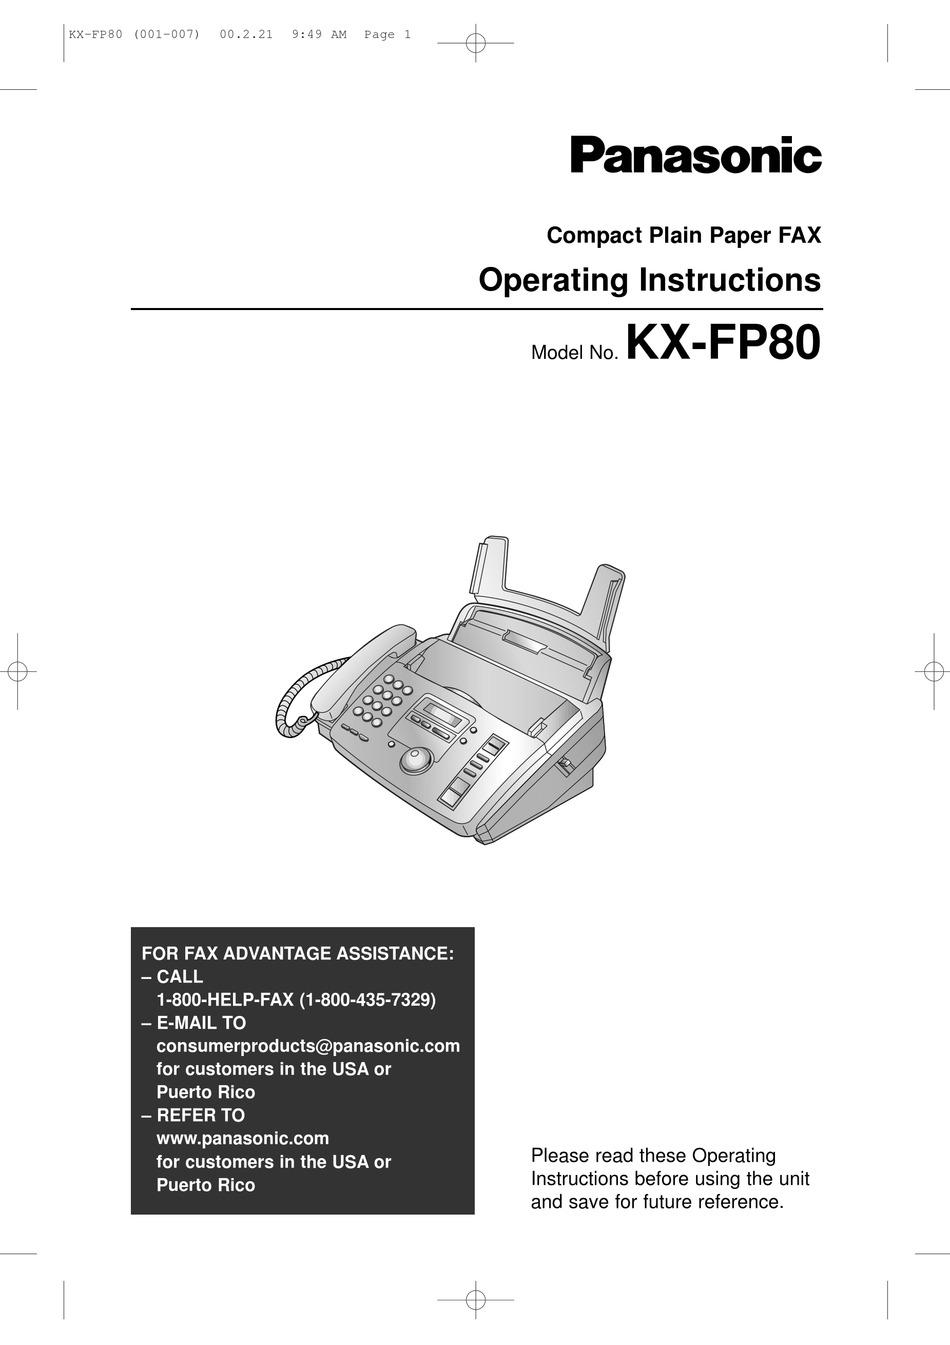 PANASONIC KX-FP80 OPERATING INSTRUCTIONS MANUAL Pdf